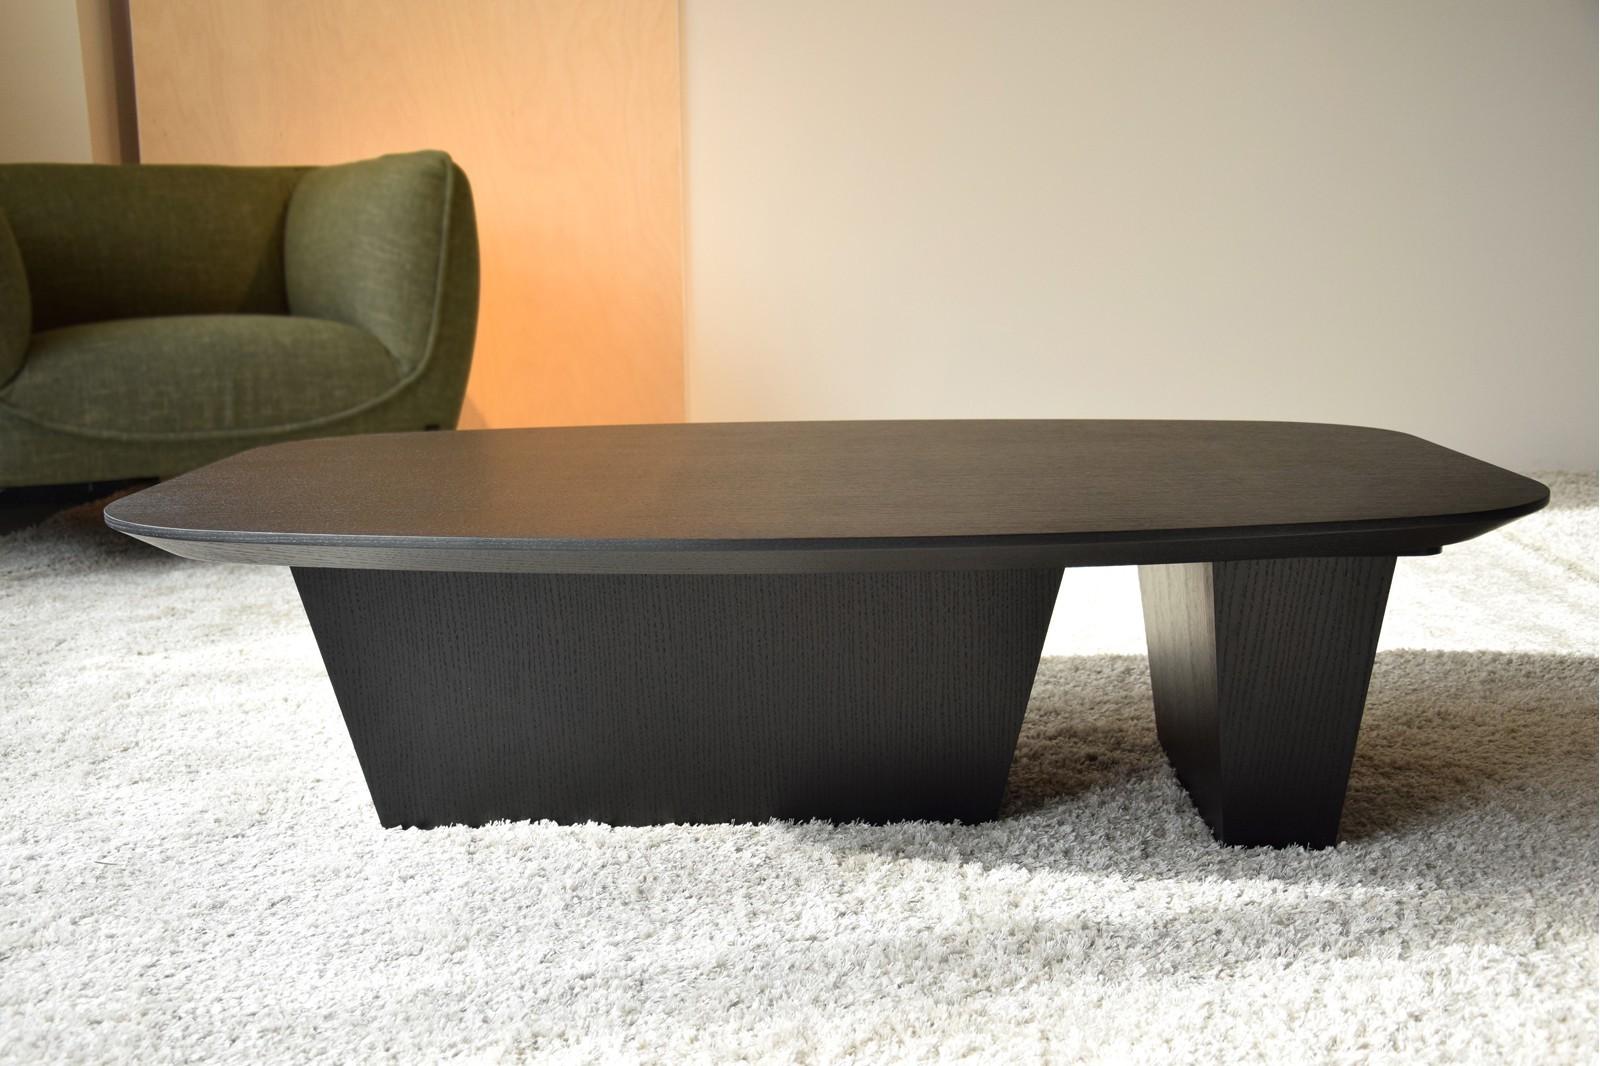 COFFEE TABLE. OAK IN BLACK COLOR